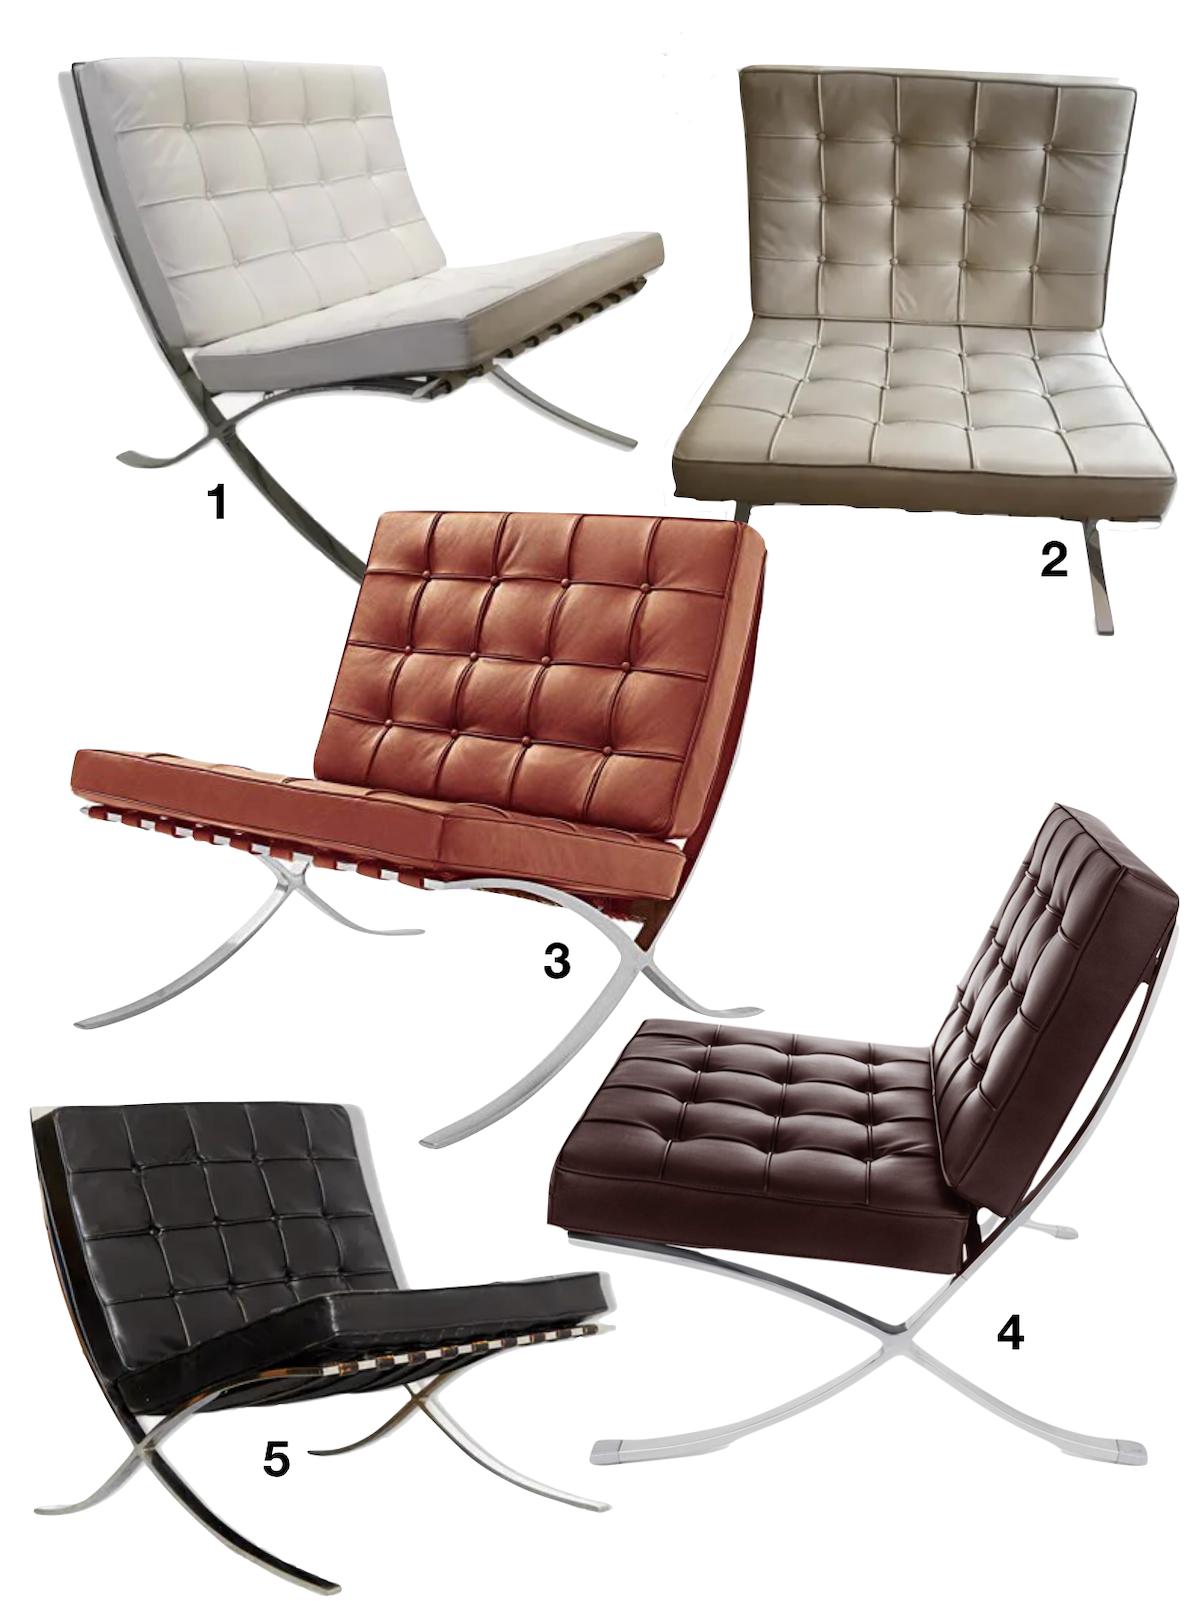 shopping liste chaise fauteuil barcelone barcelona selency - blog déco - clematc